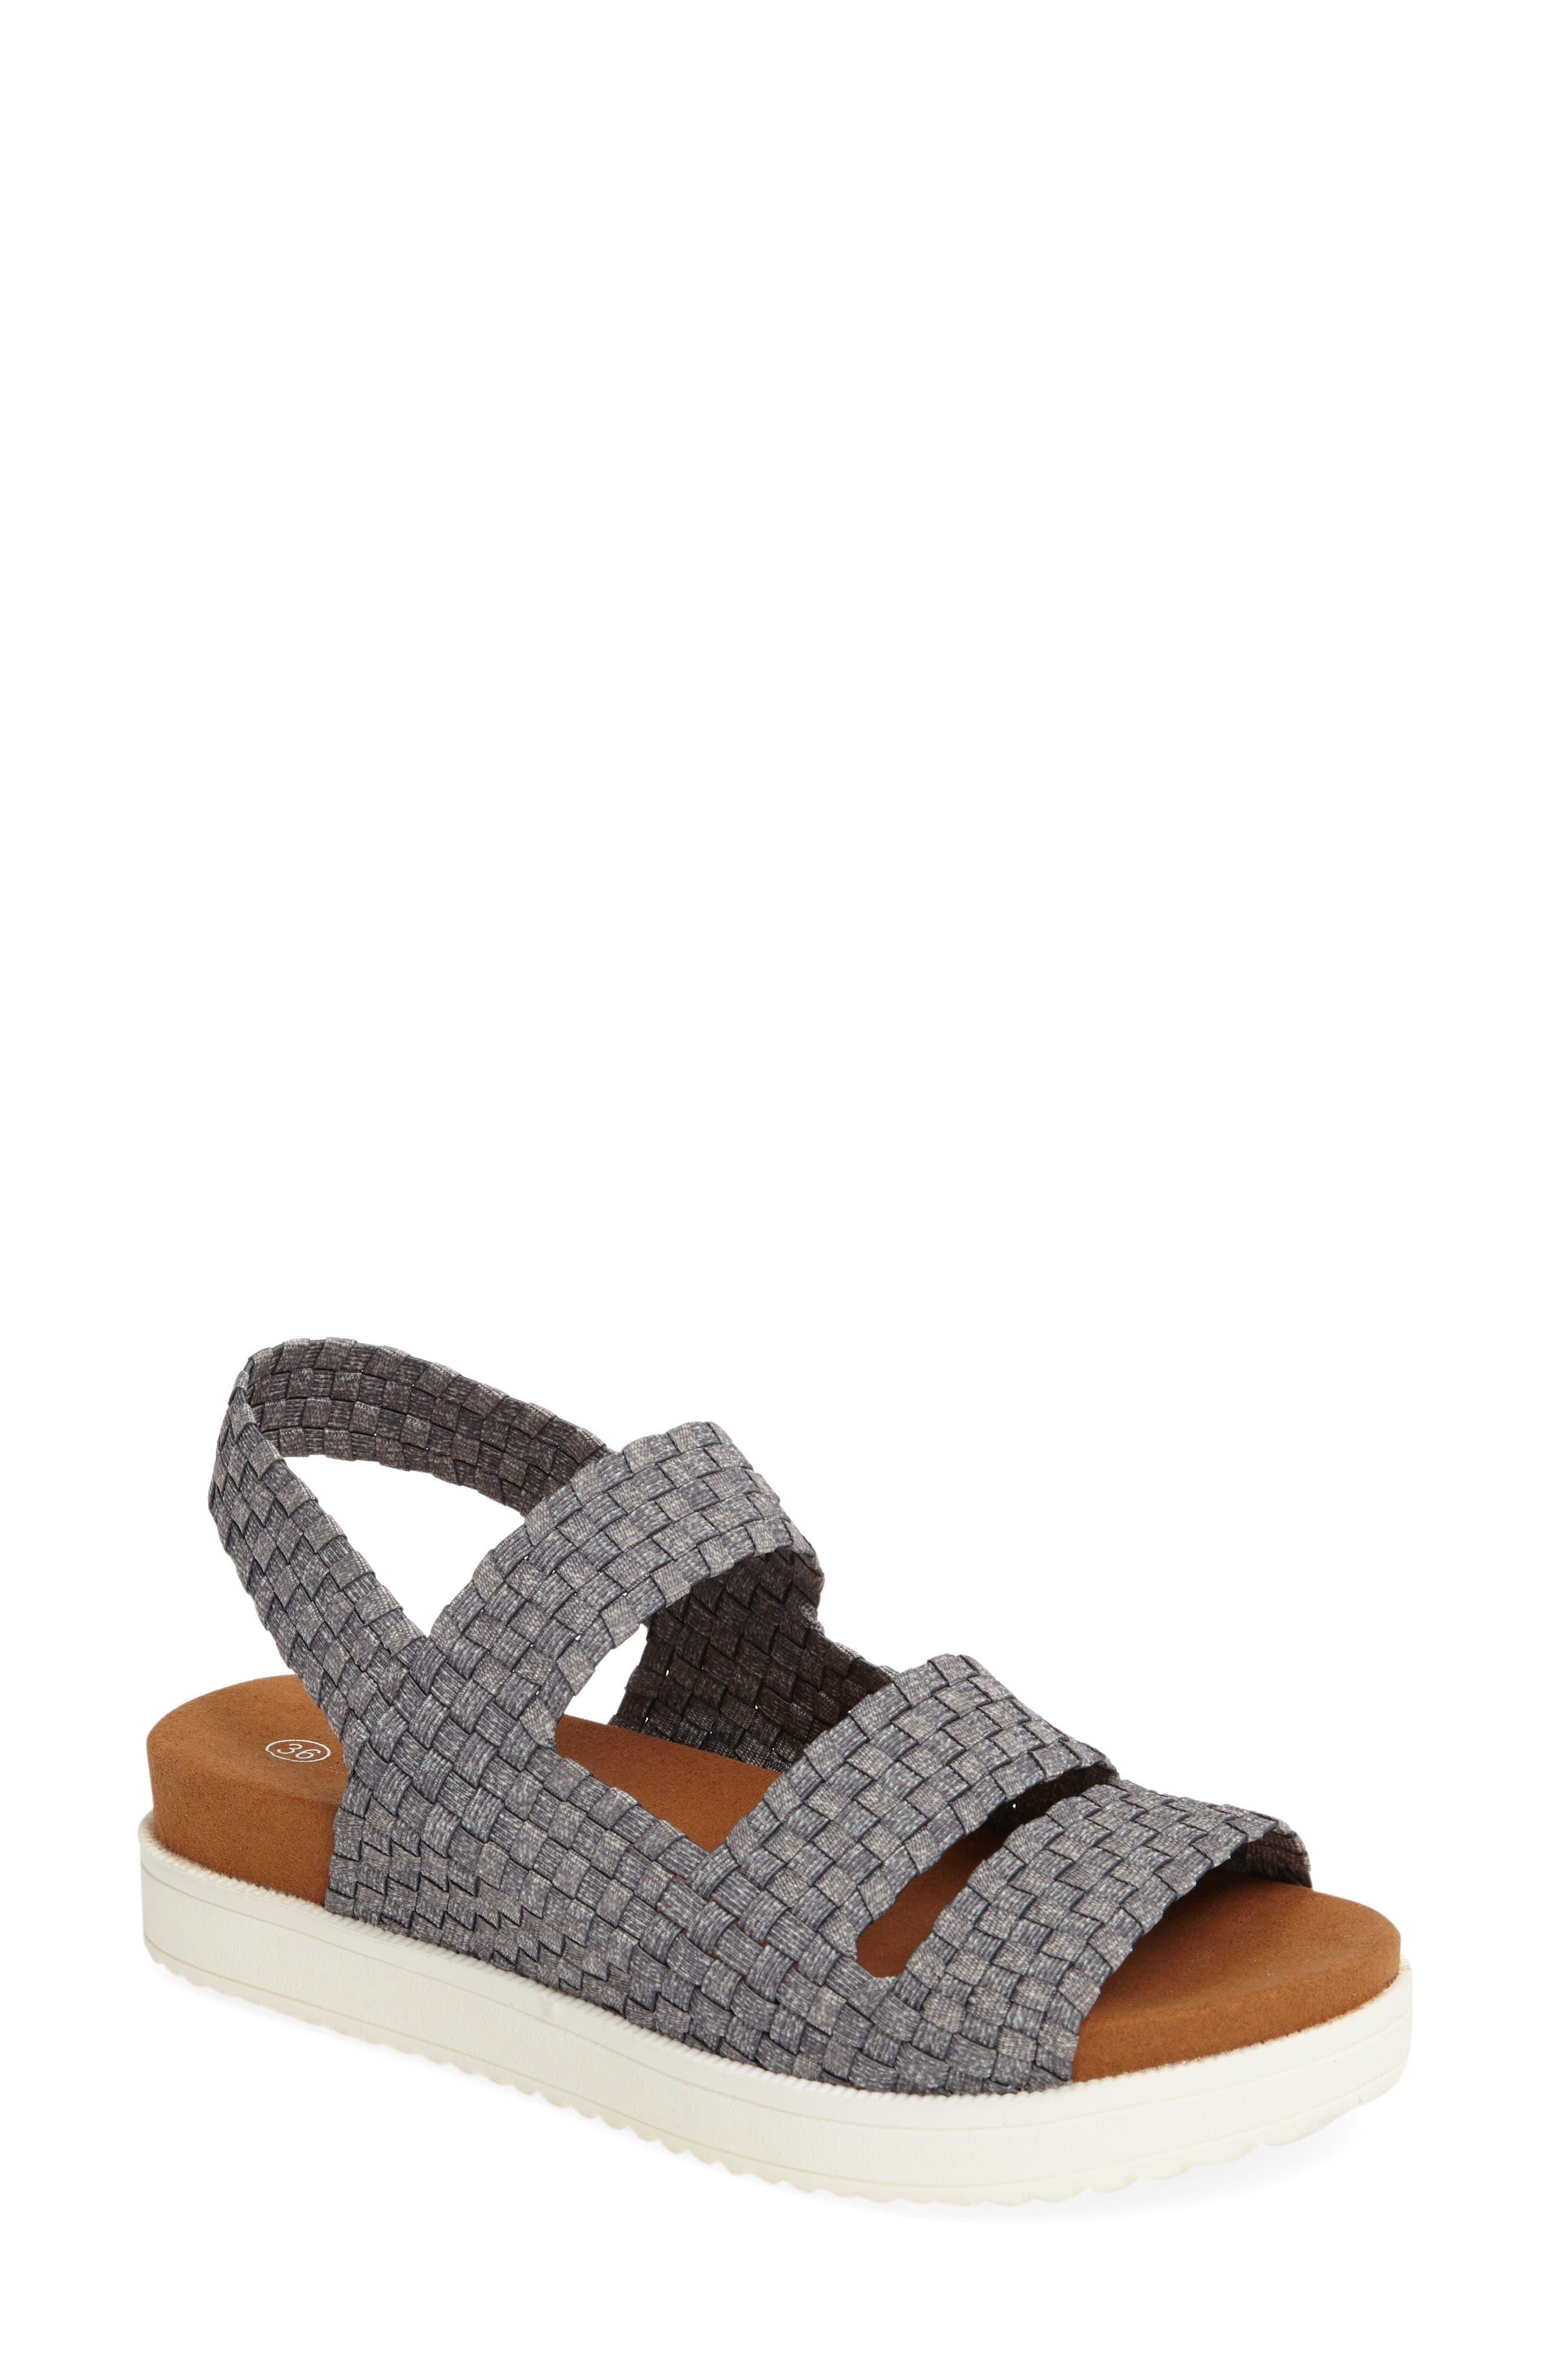 Bernie Mev Women's 'Crisp' Woven Platform Sandal